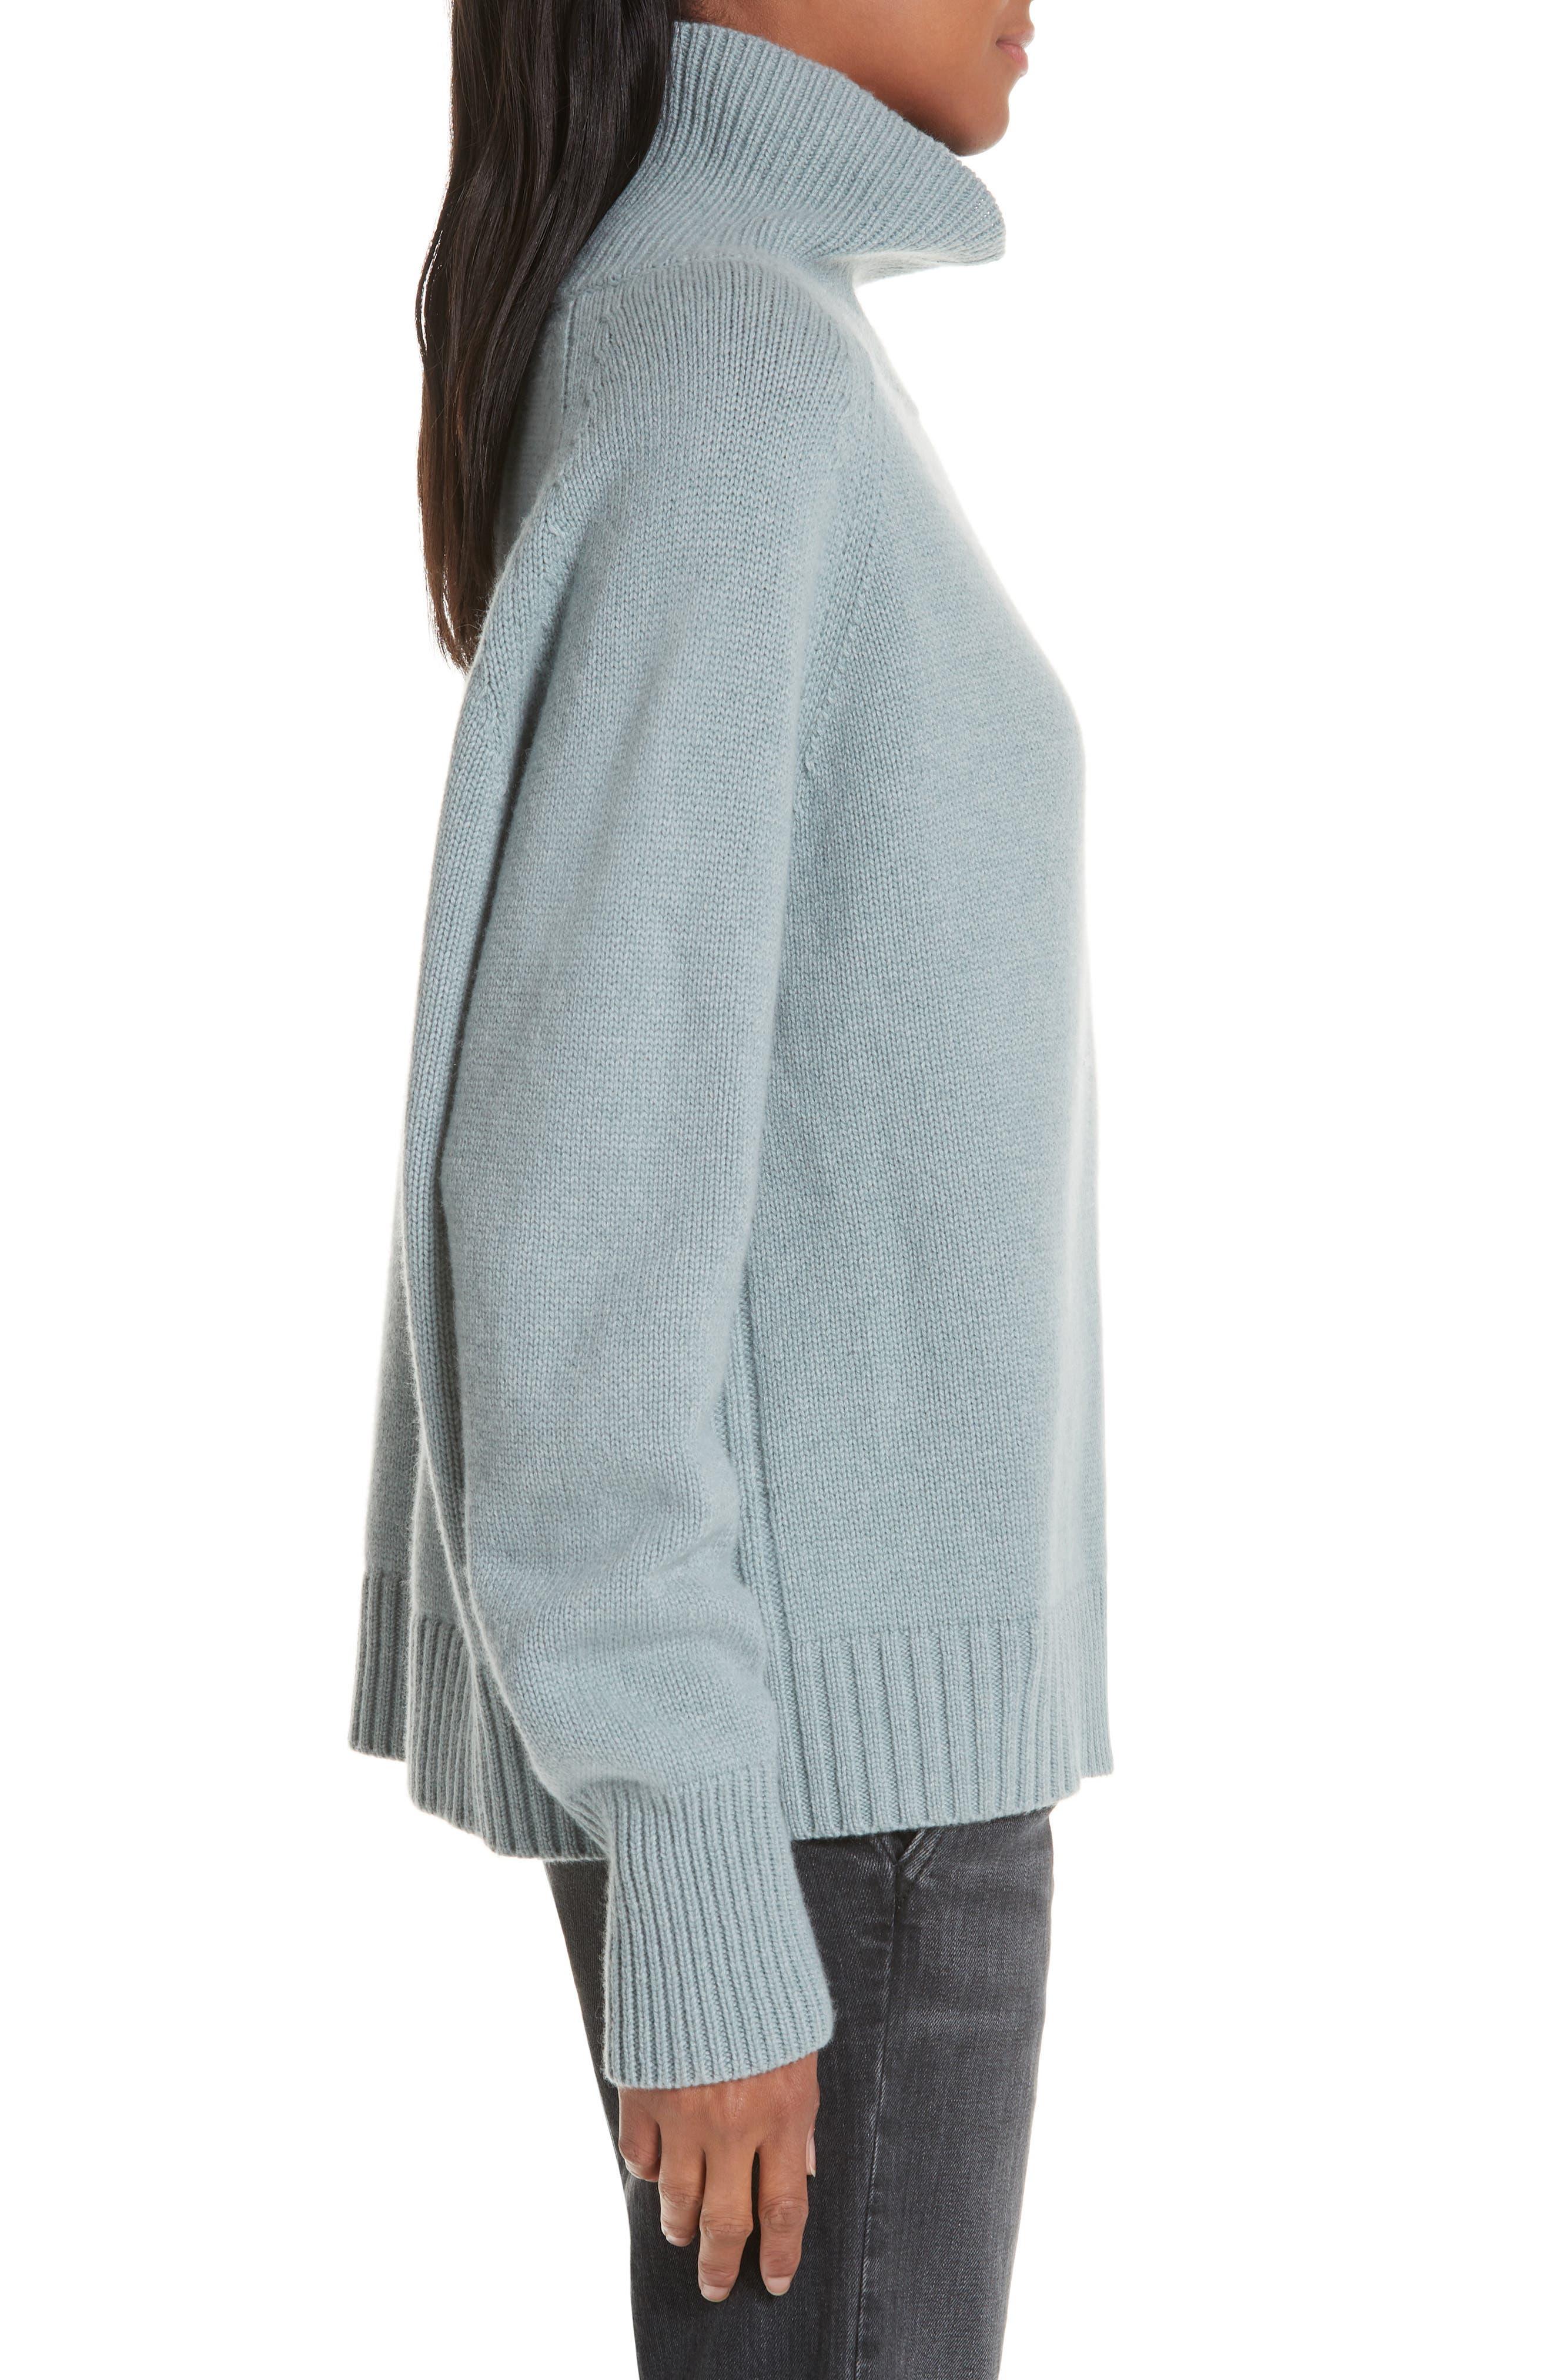 NILI LOTAN, Mariah Funnel Neck Cashmere Sweater, Alternate thumbnail 3, color, SKY BLUE